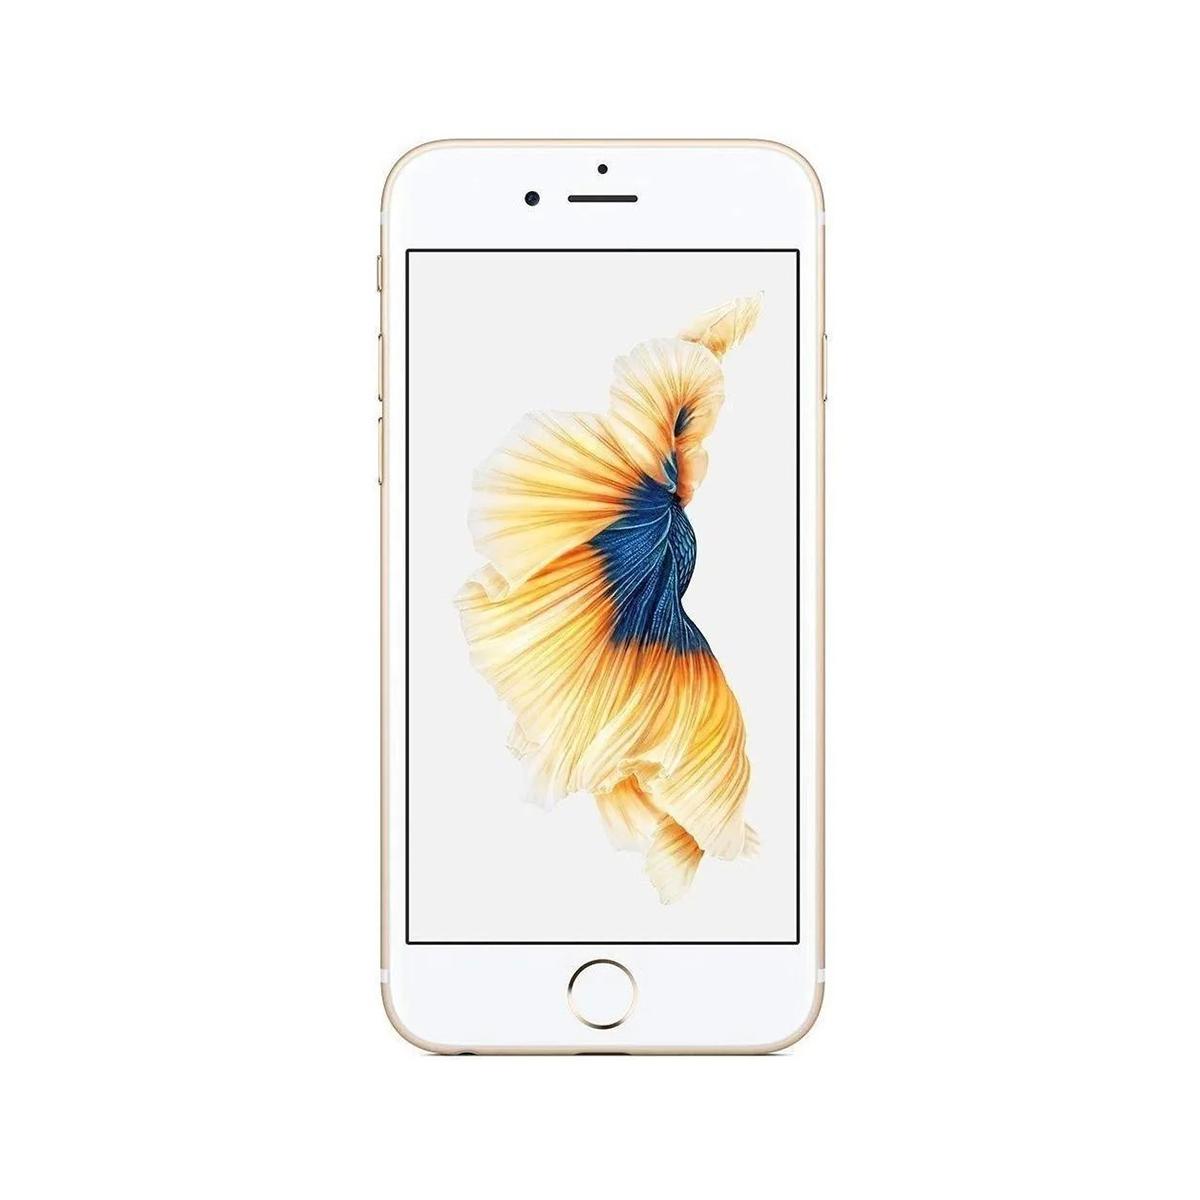 Smartphone Apple iPhone 6s 64GB Tela 4.7' 12MP - Mostruário